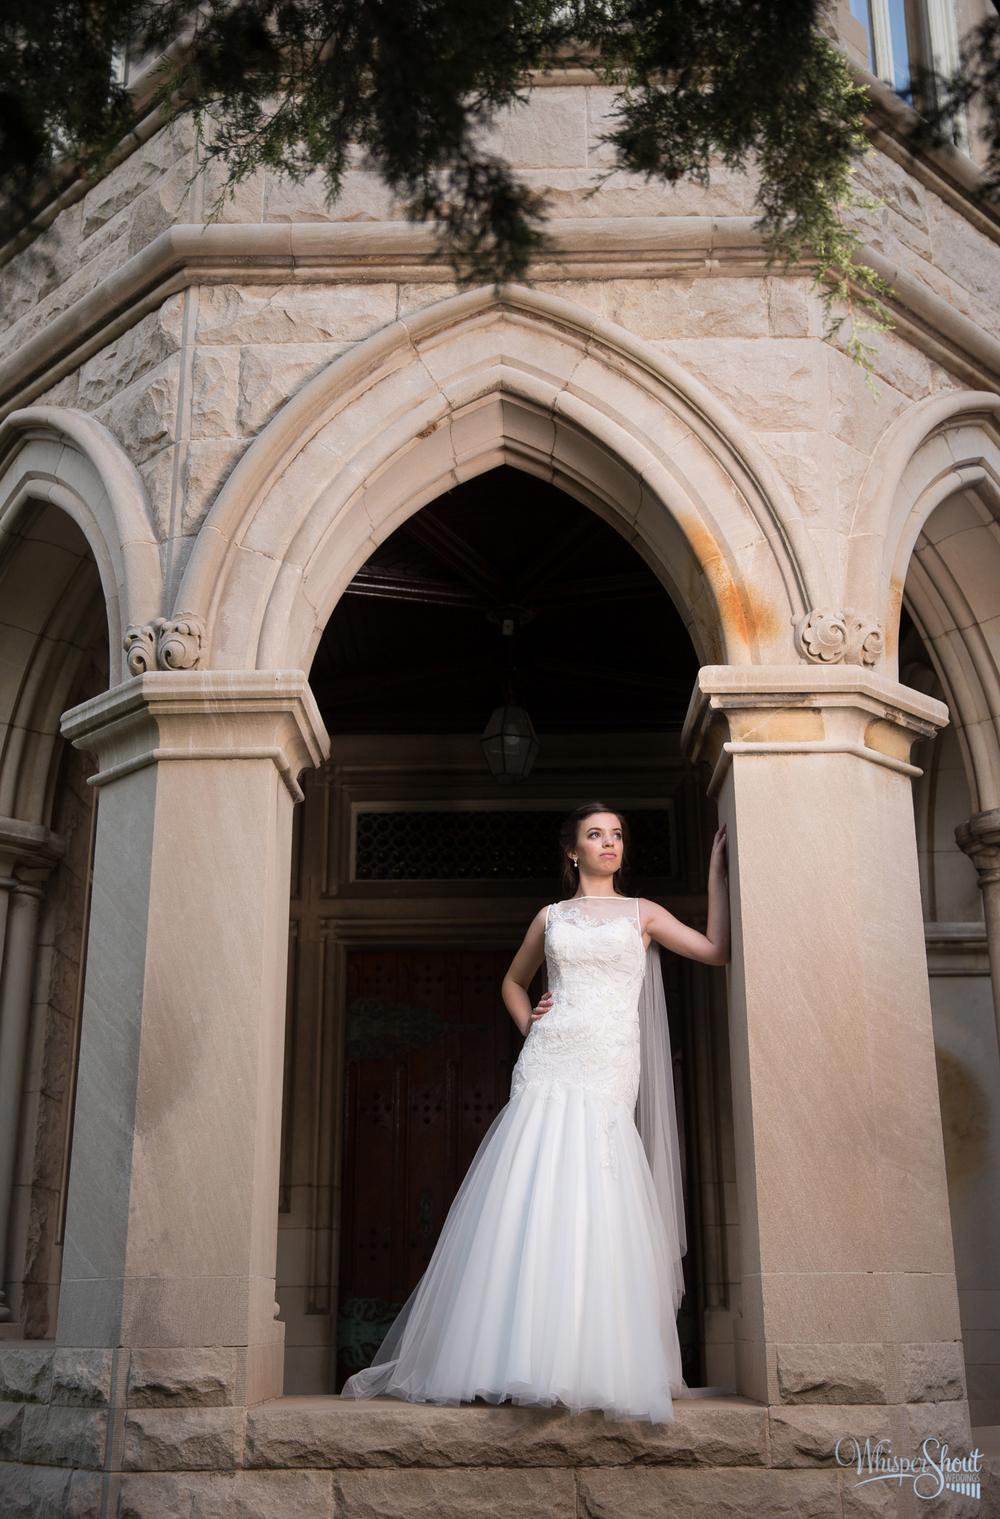 WhisperShout Weddings;  north carolina bridal session; boatneckbridal gownwith drop waist.